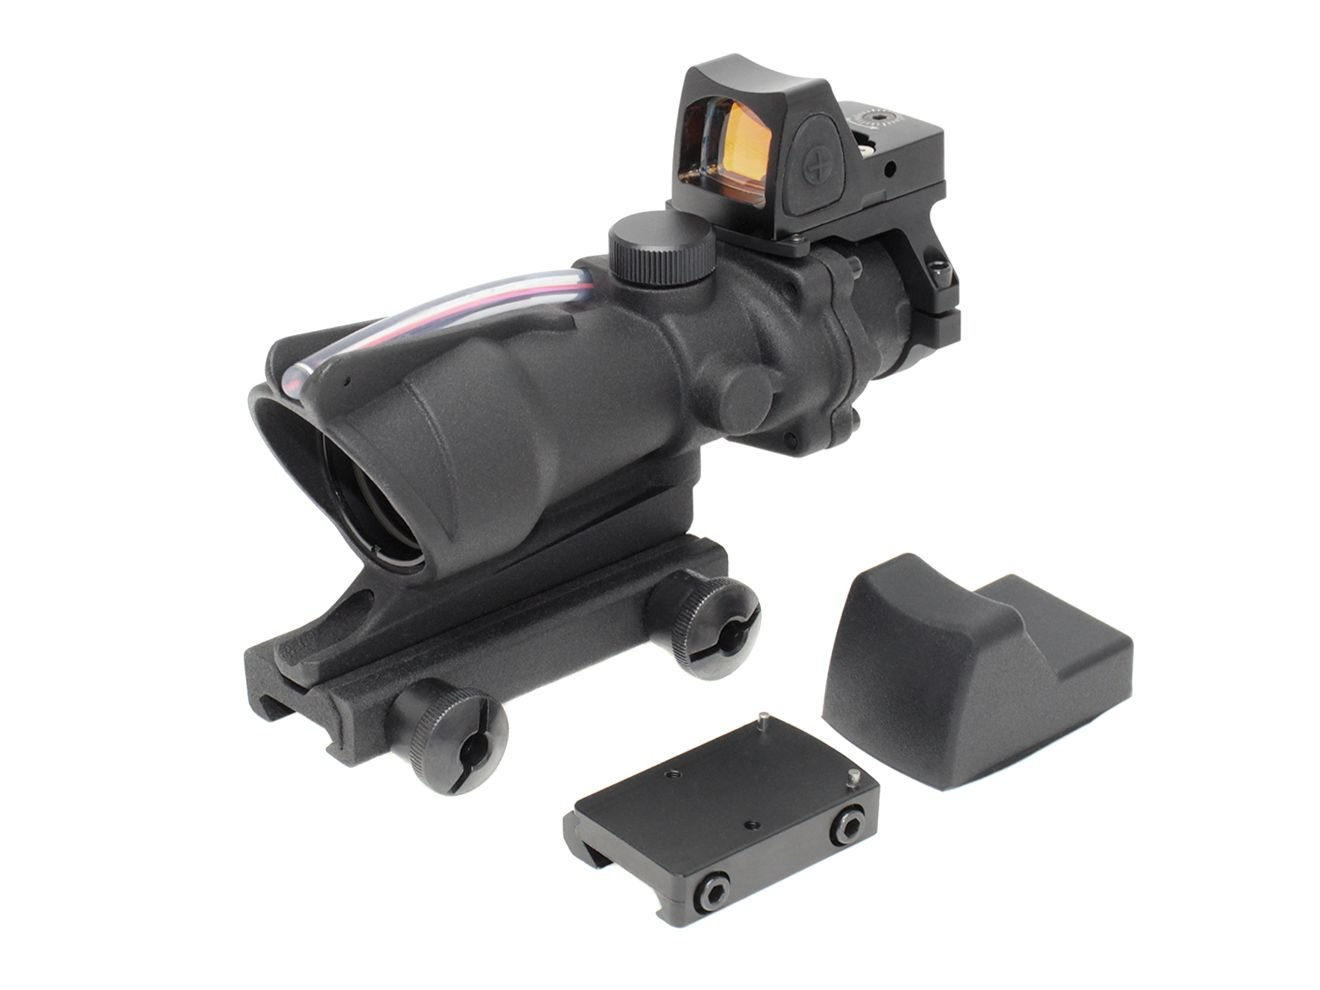 M150 RCO TA31 ECOS COMBO 4×32タクティカル CQBスコープ(自動調光) B077GNWVJP